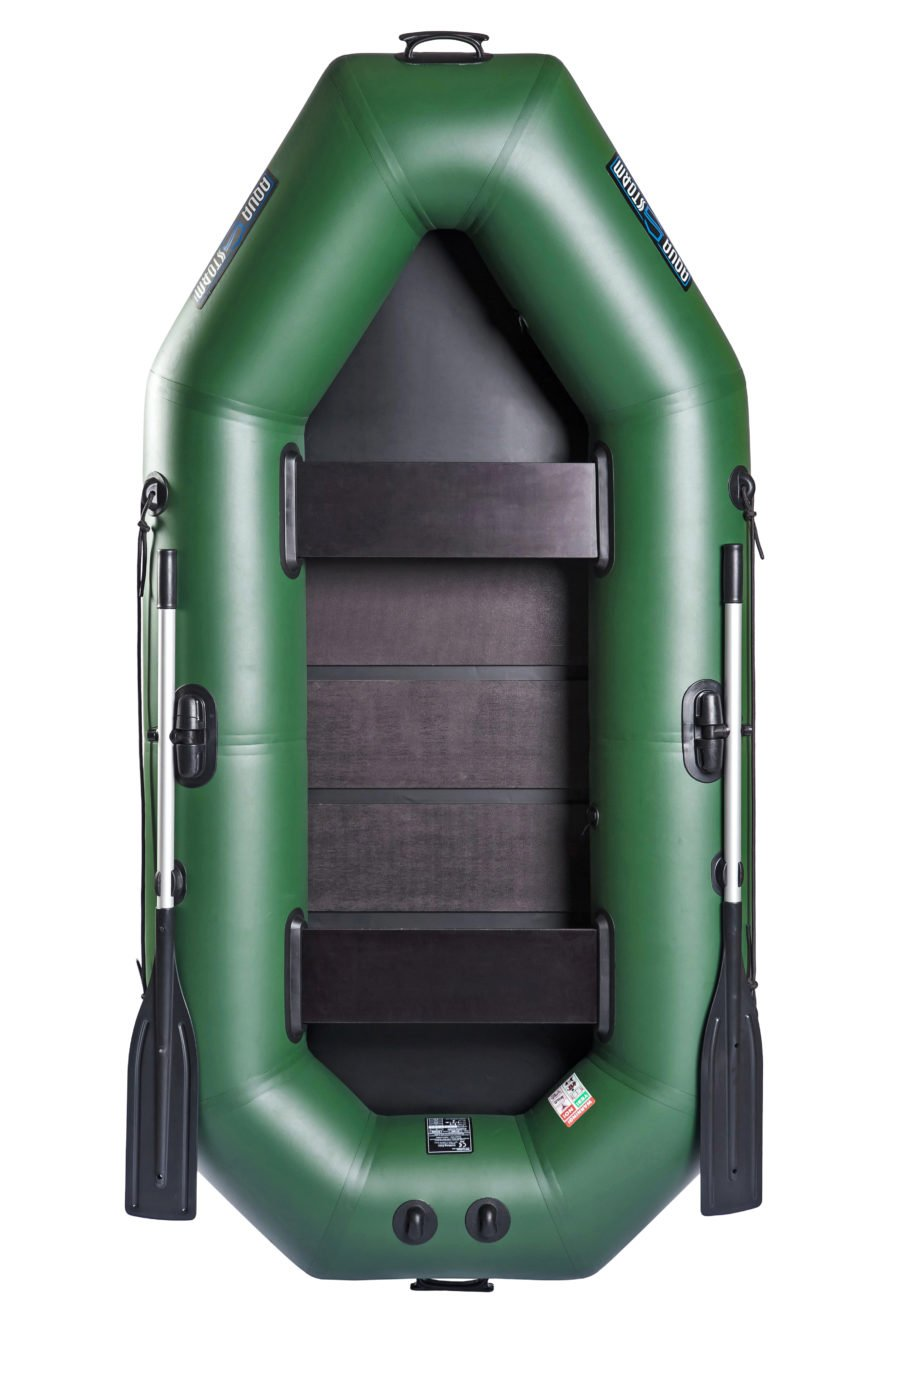 Надувная лодка Aqua-Storm St260CK слань-книжка